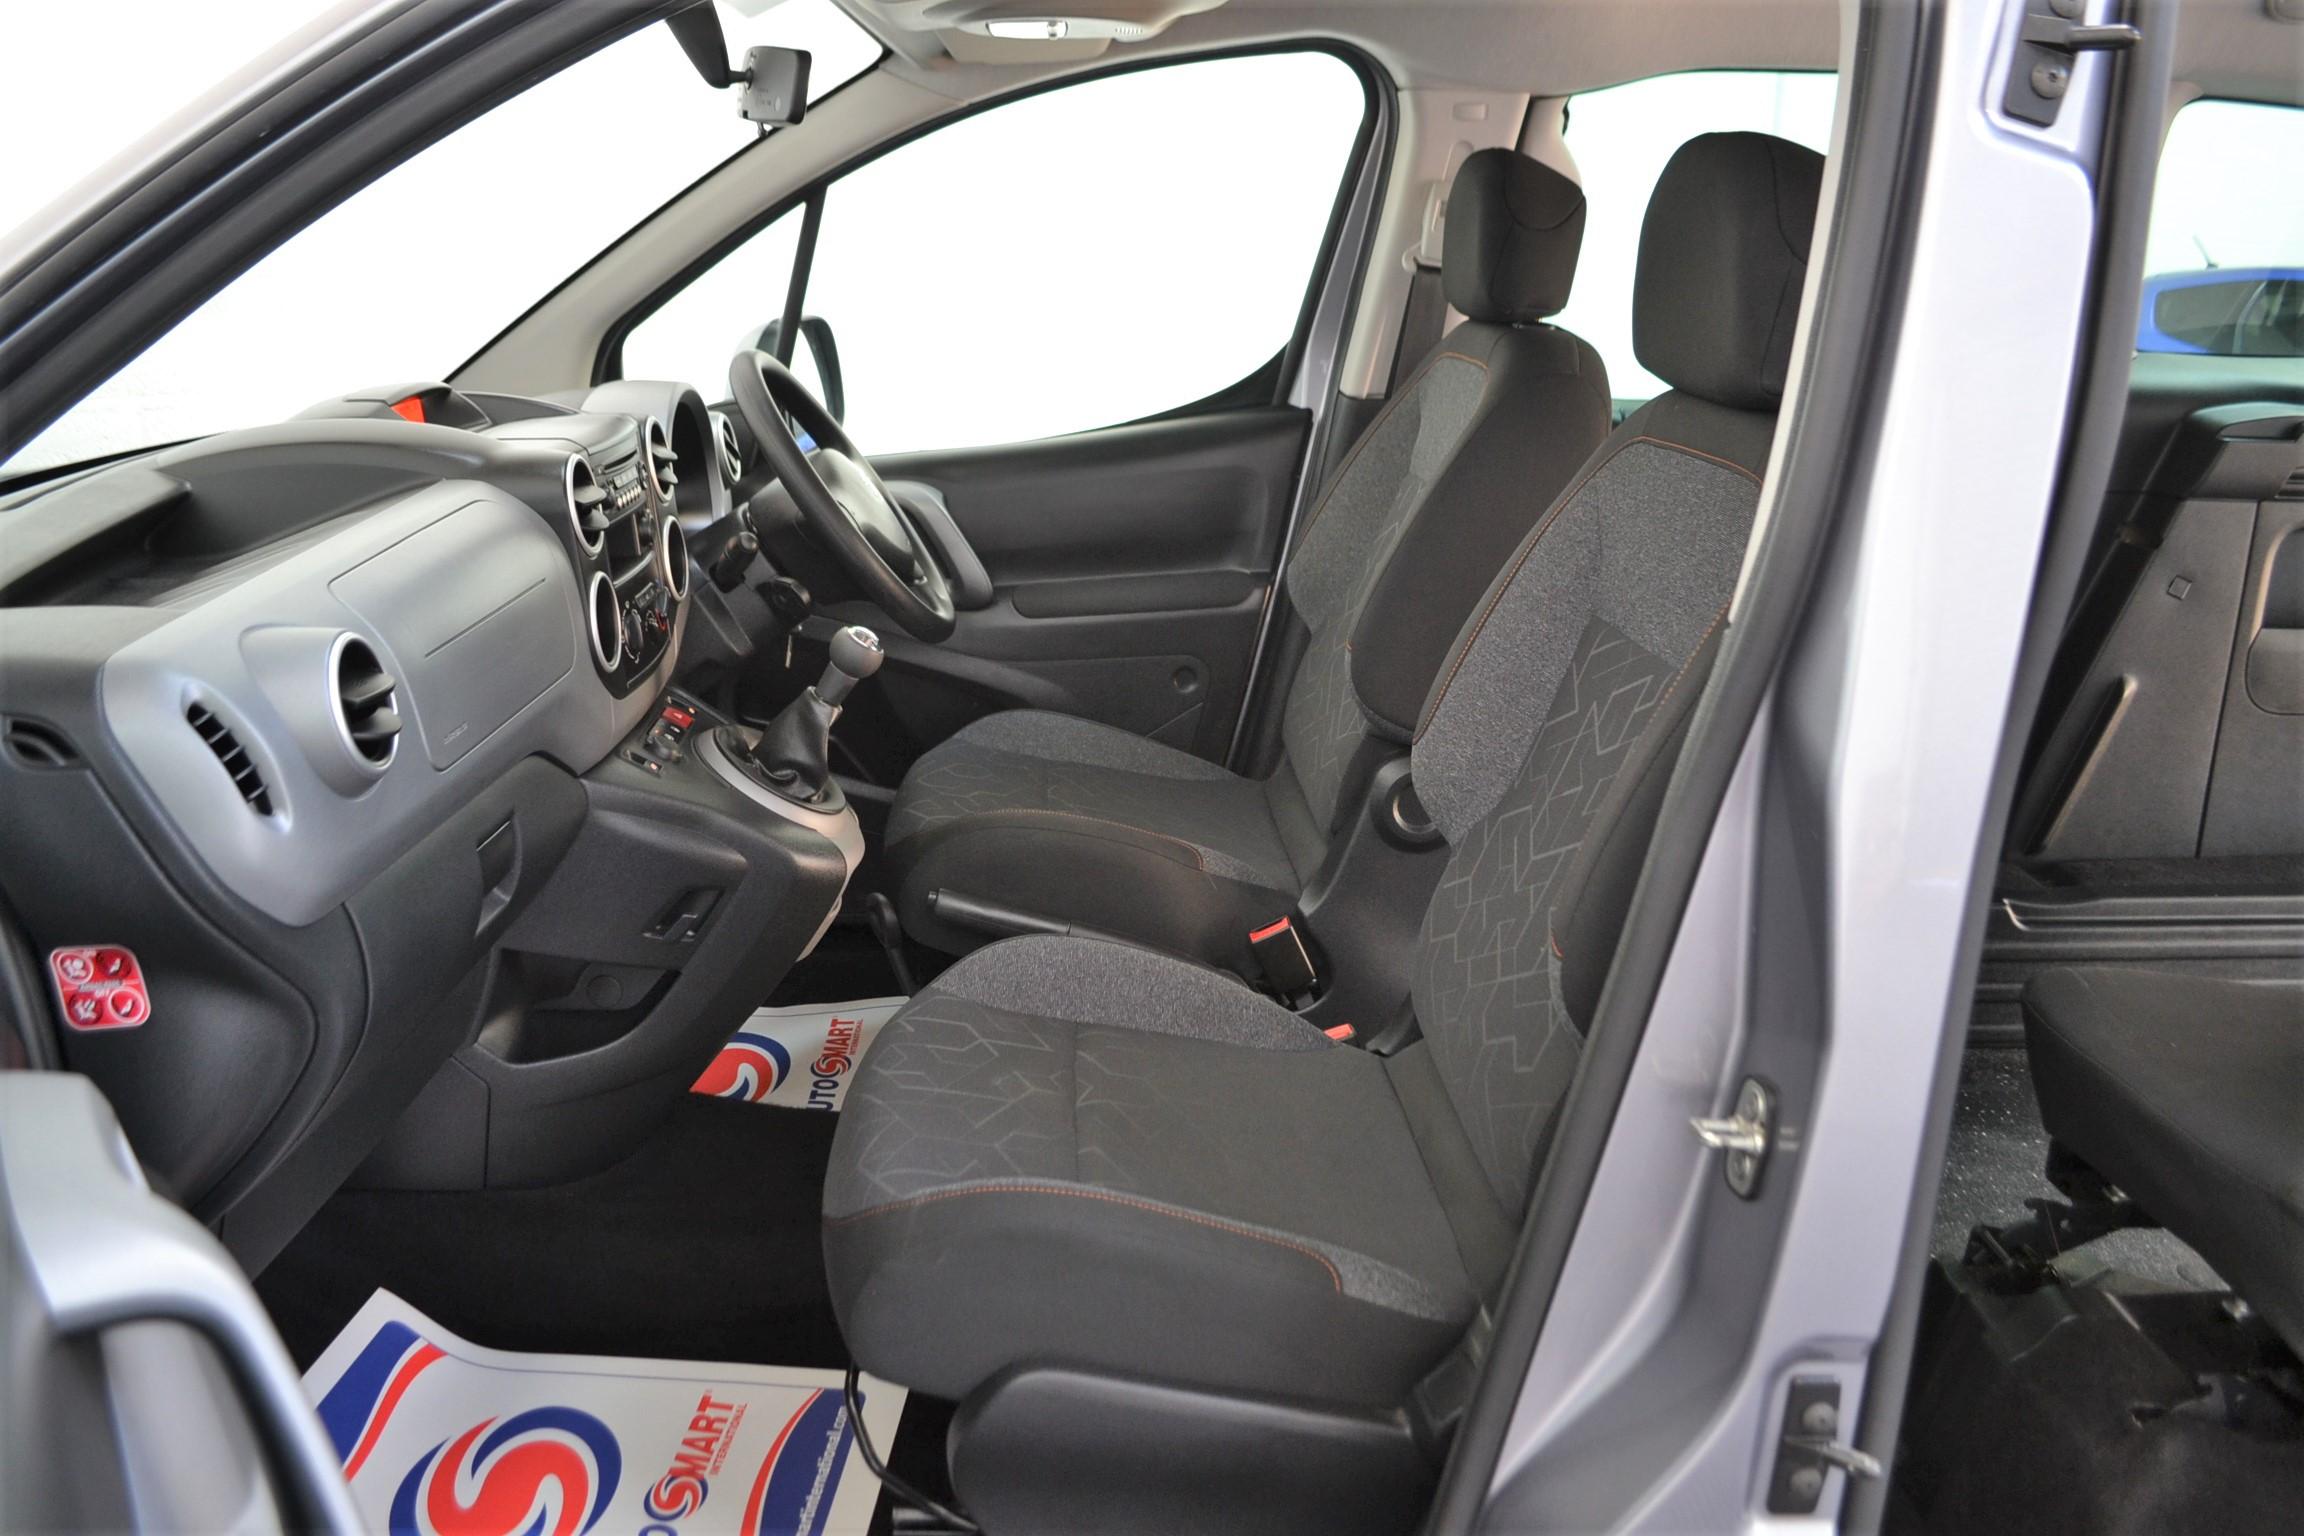 WAV Cars For Sale Bristol Wheelchair Accessible Vehicles Used For Sale Somerset Devon Dorset Bath Peugeot Partner SD17 OZL 12